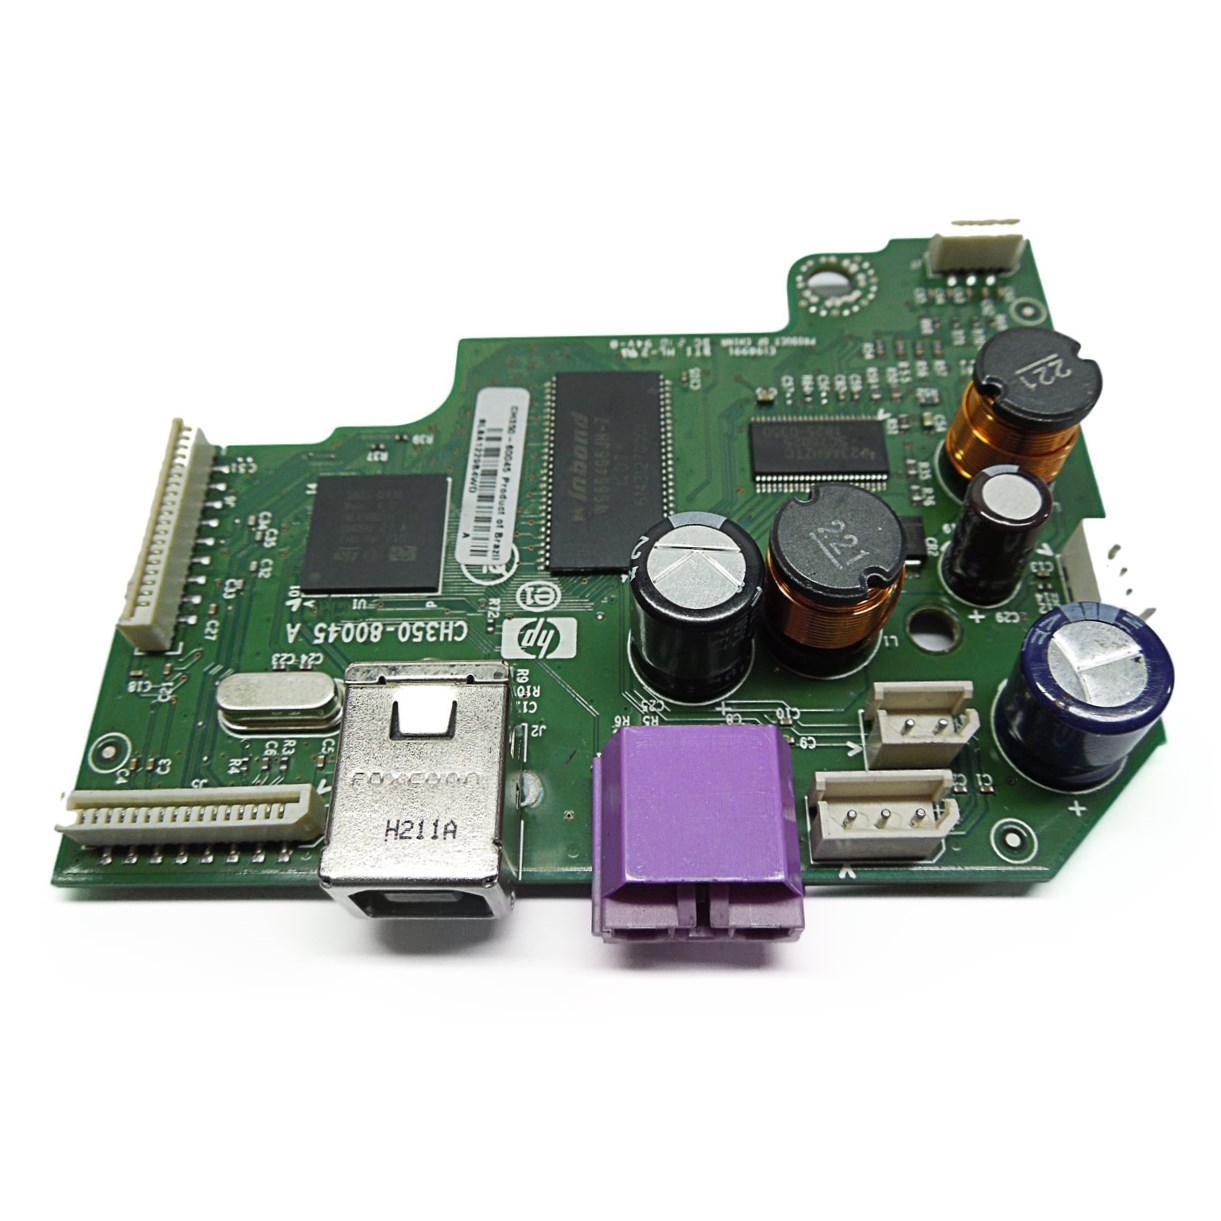 Placa Lógica da Multifuncional HP F2050 - CH350-80045